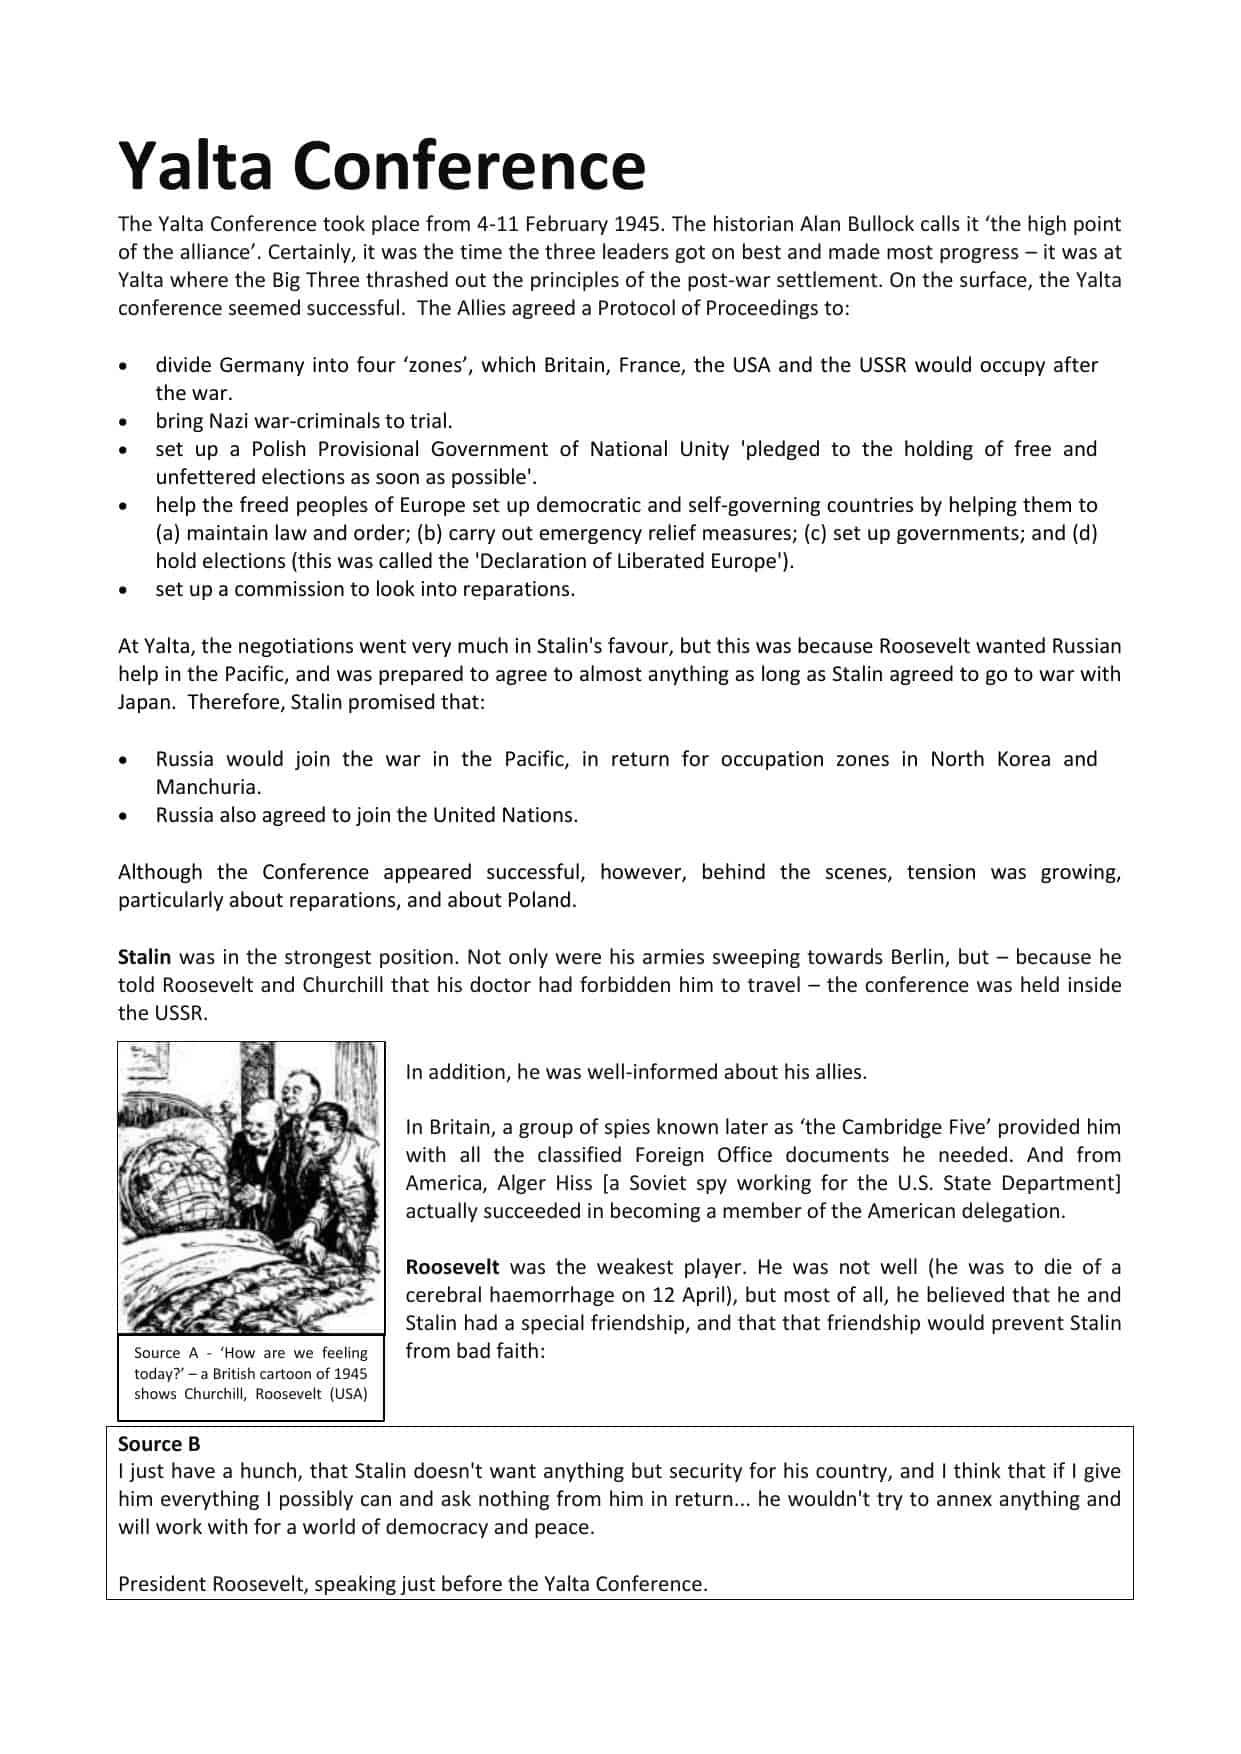 Yalta Conference Facts Amp Information Worksheet